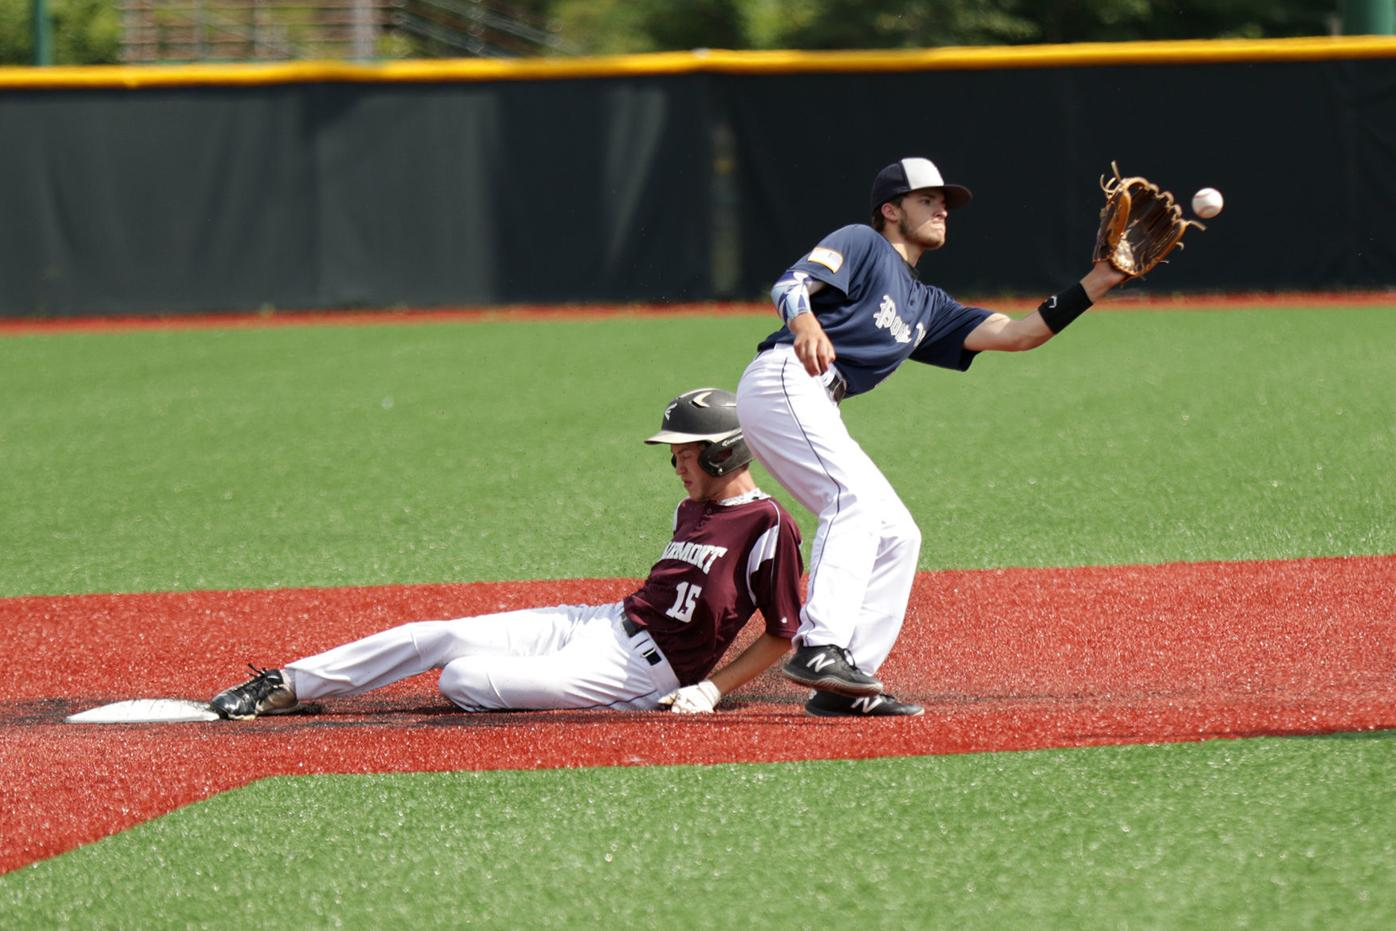 Connor Saunders slides into second base safely